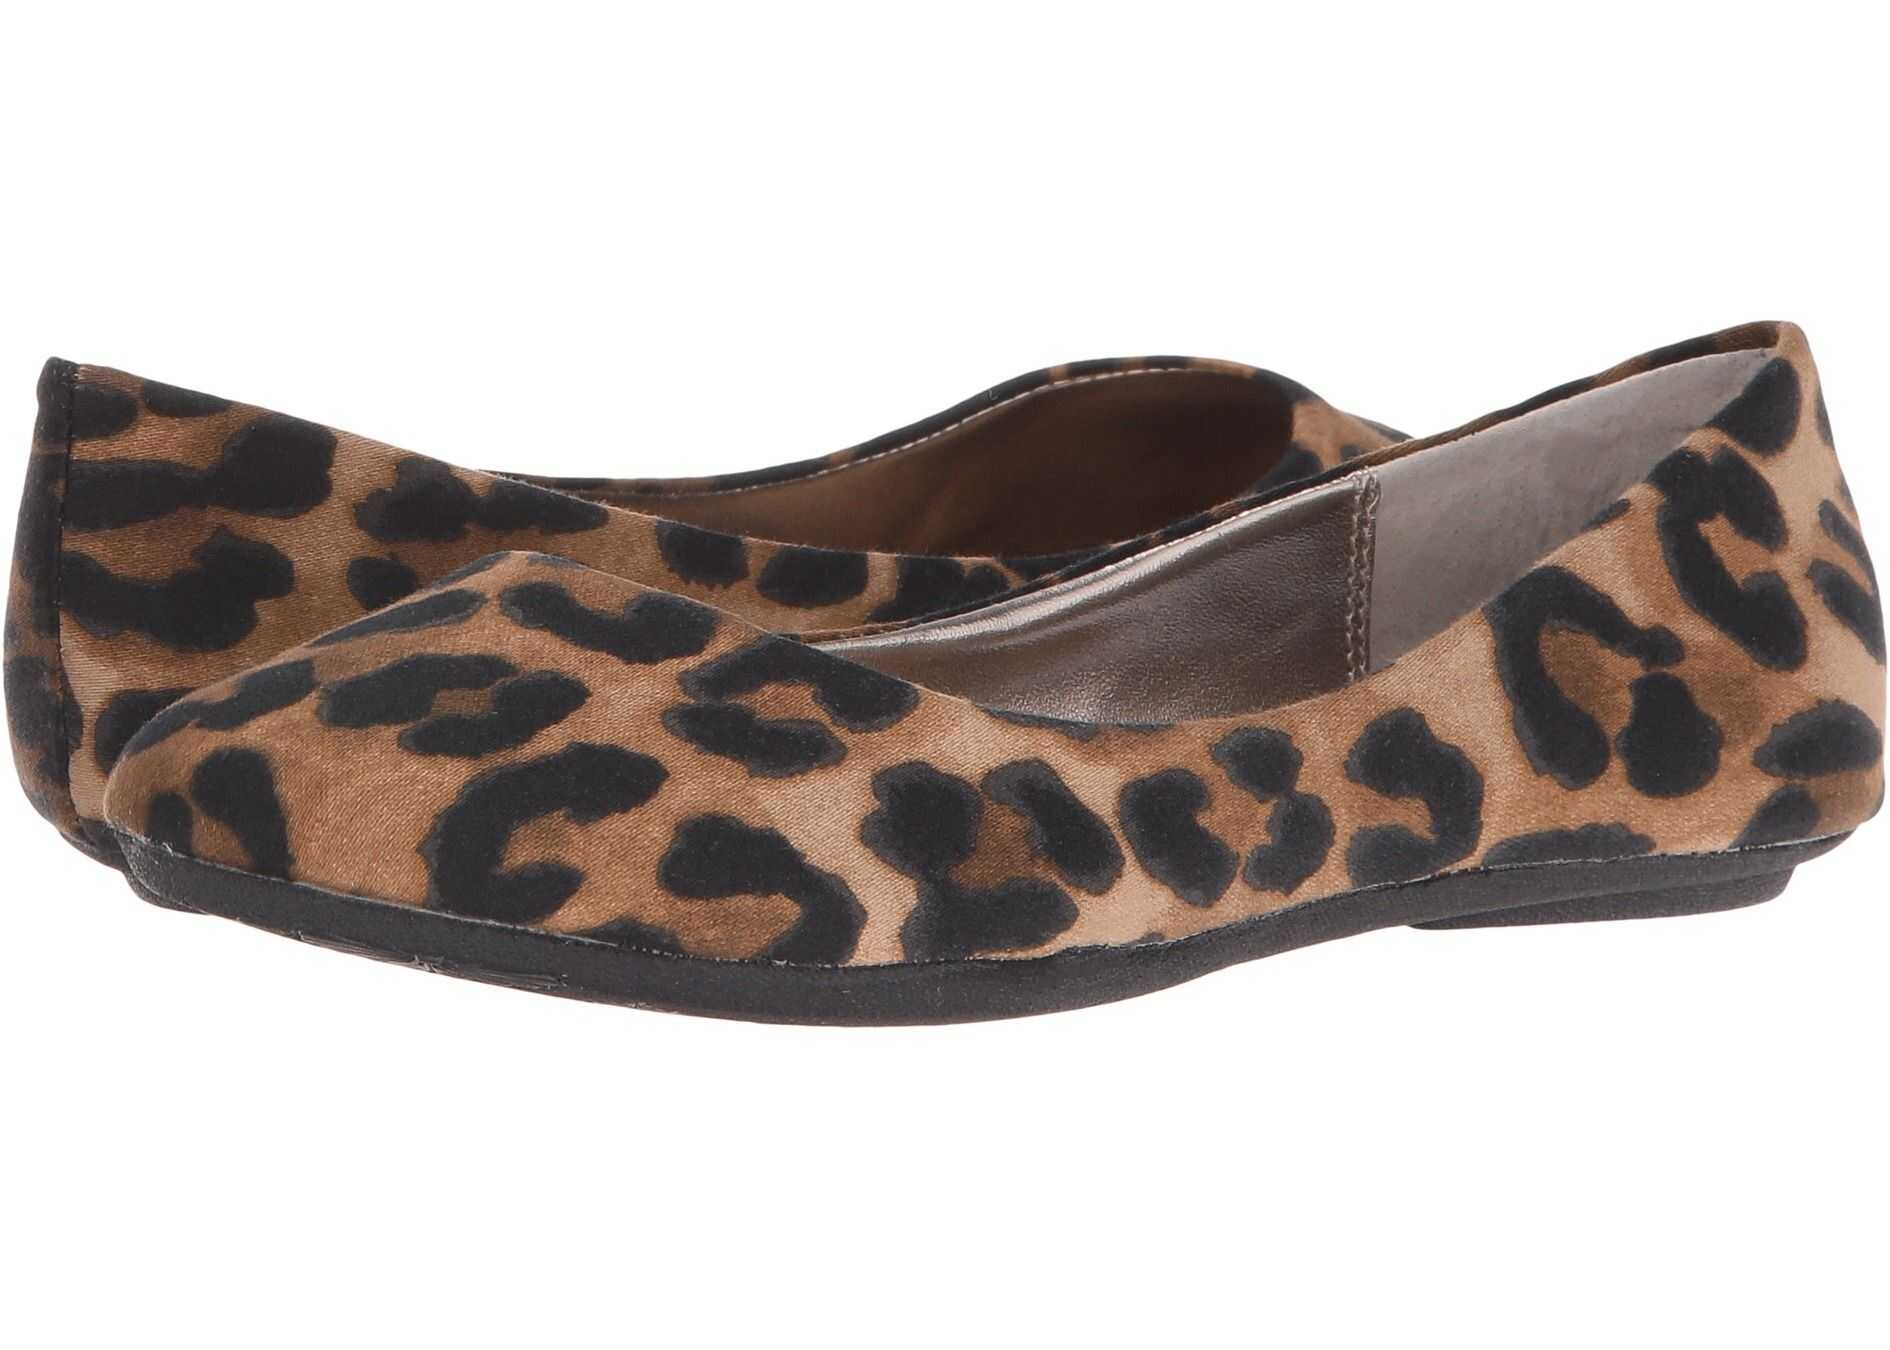 Steve Madden P-Heaven Leopard Fabric